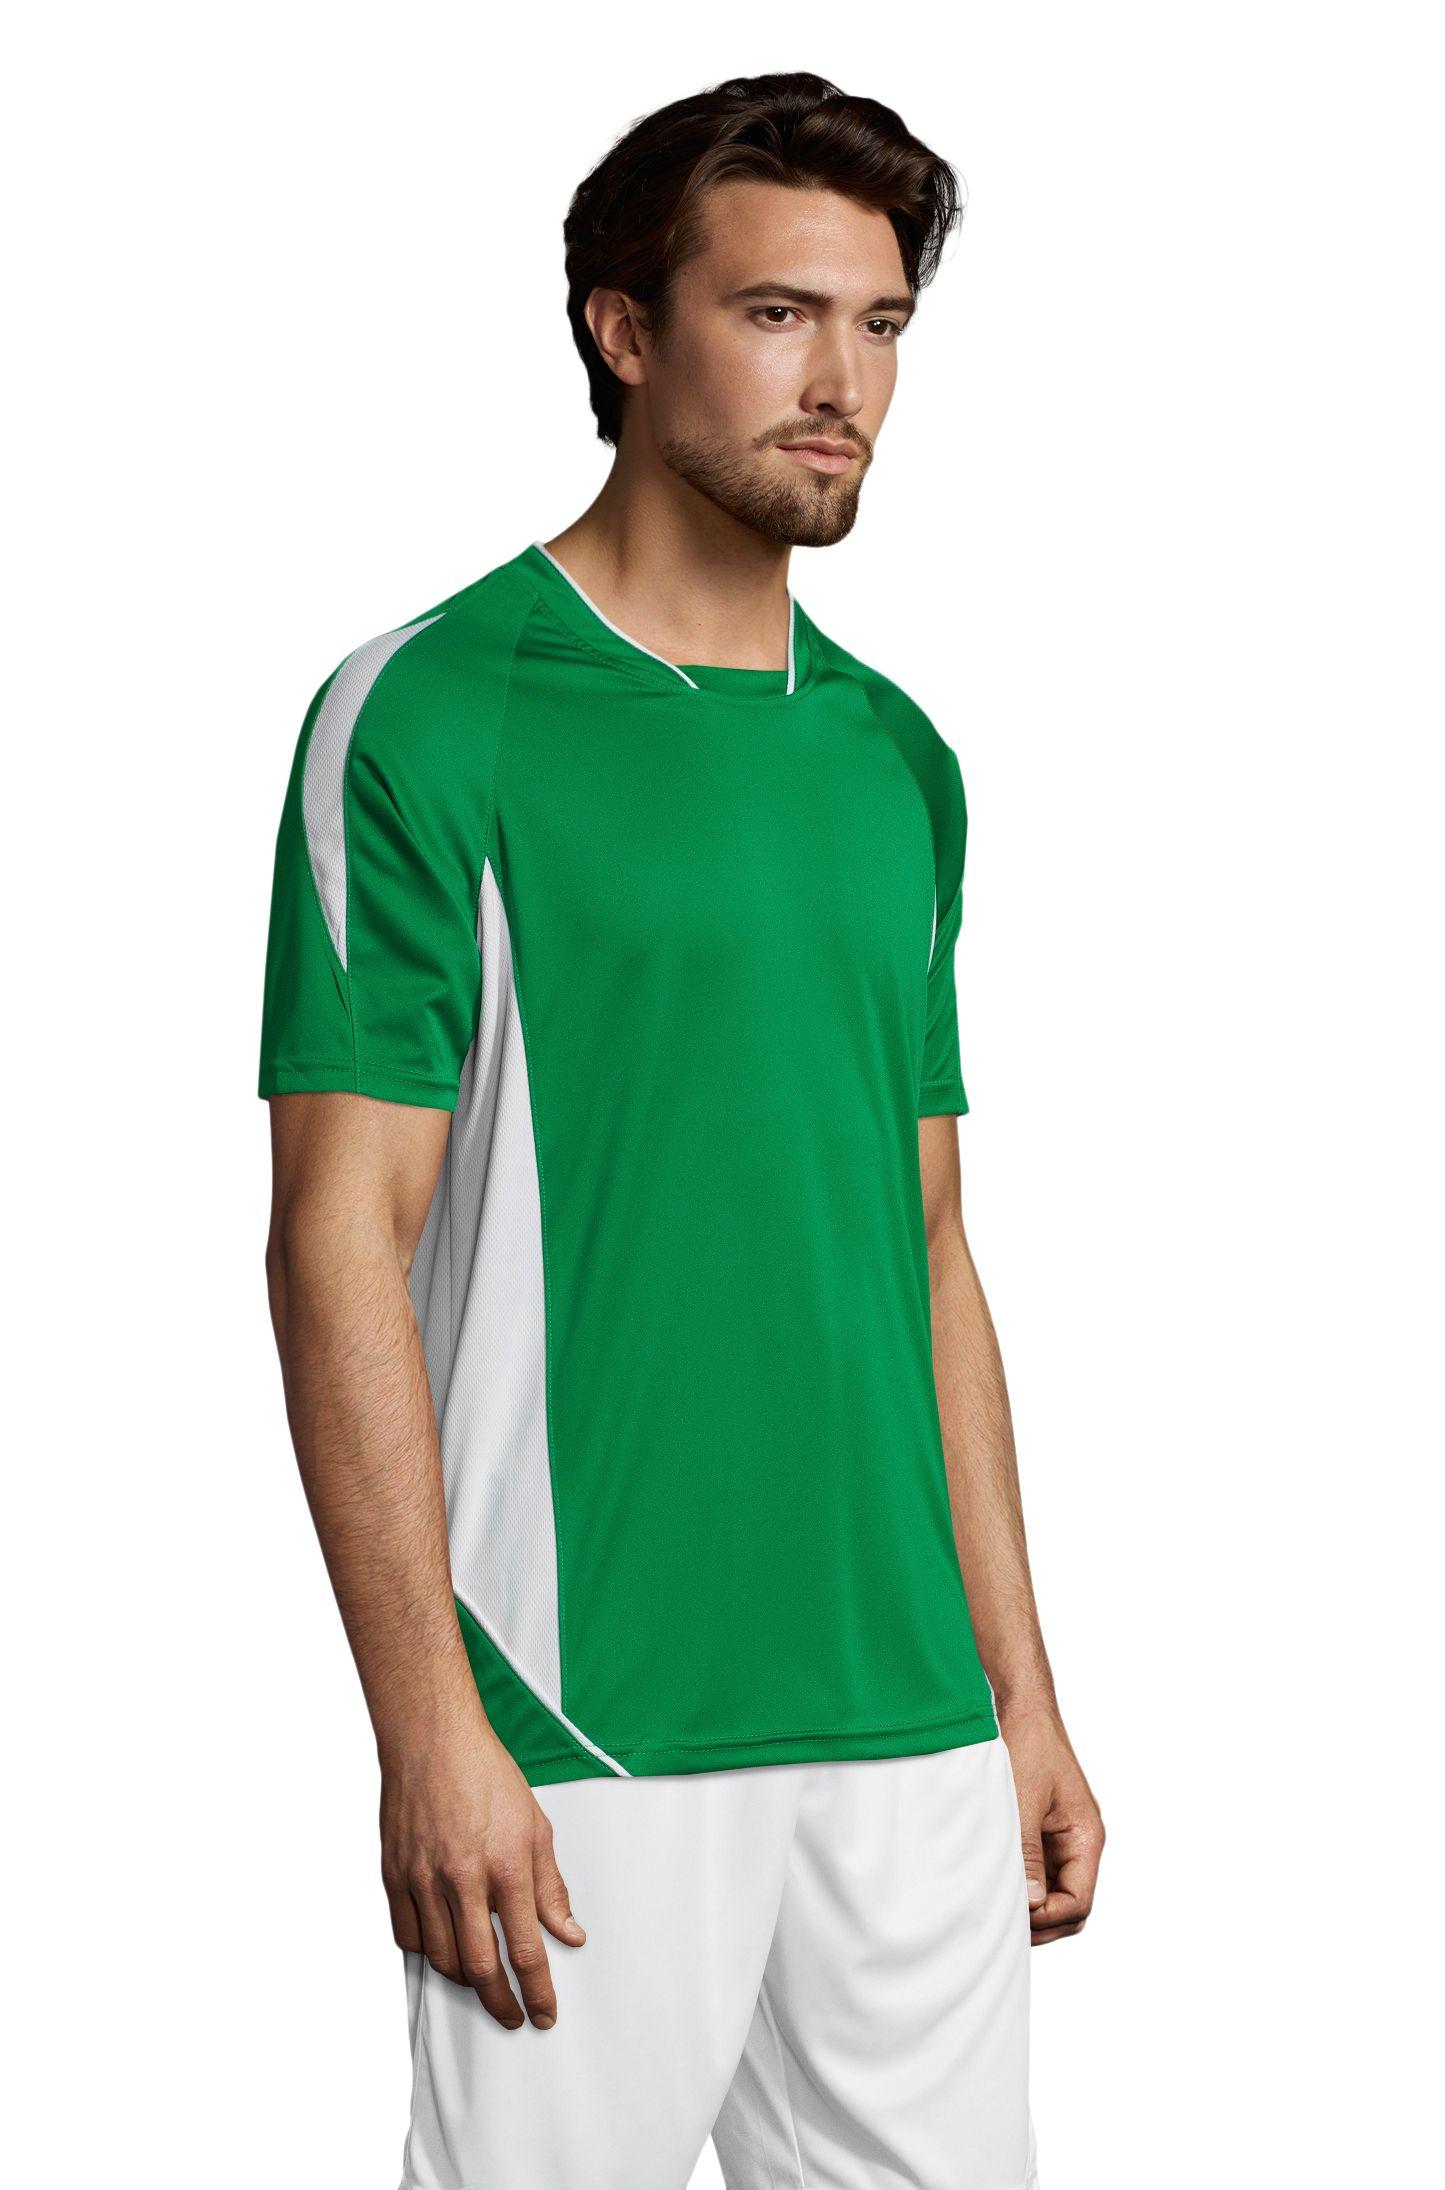 933 - Vert vif / Blanc